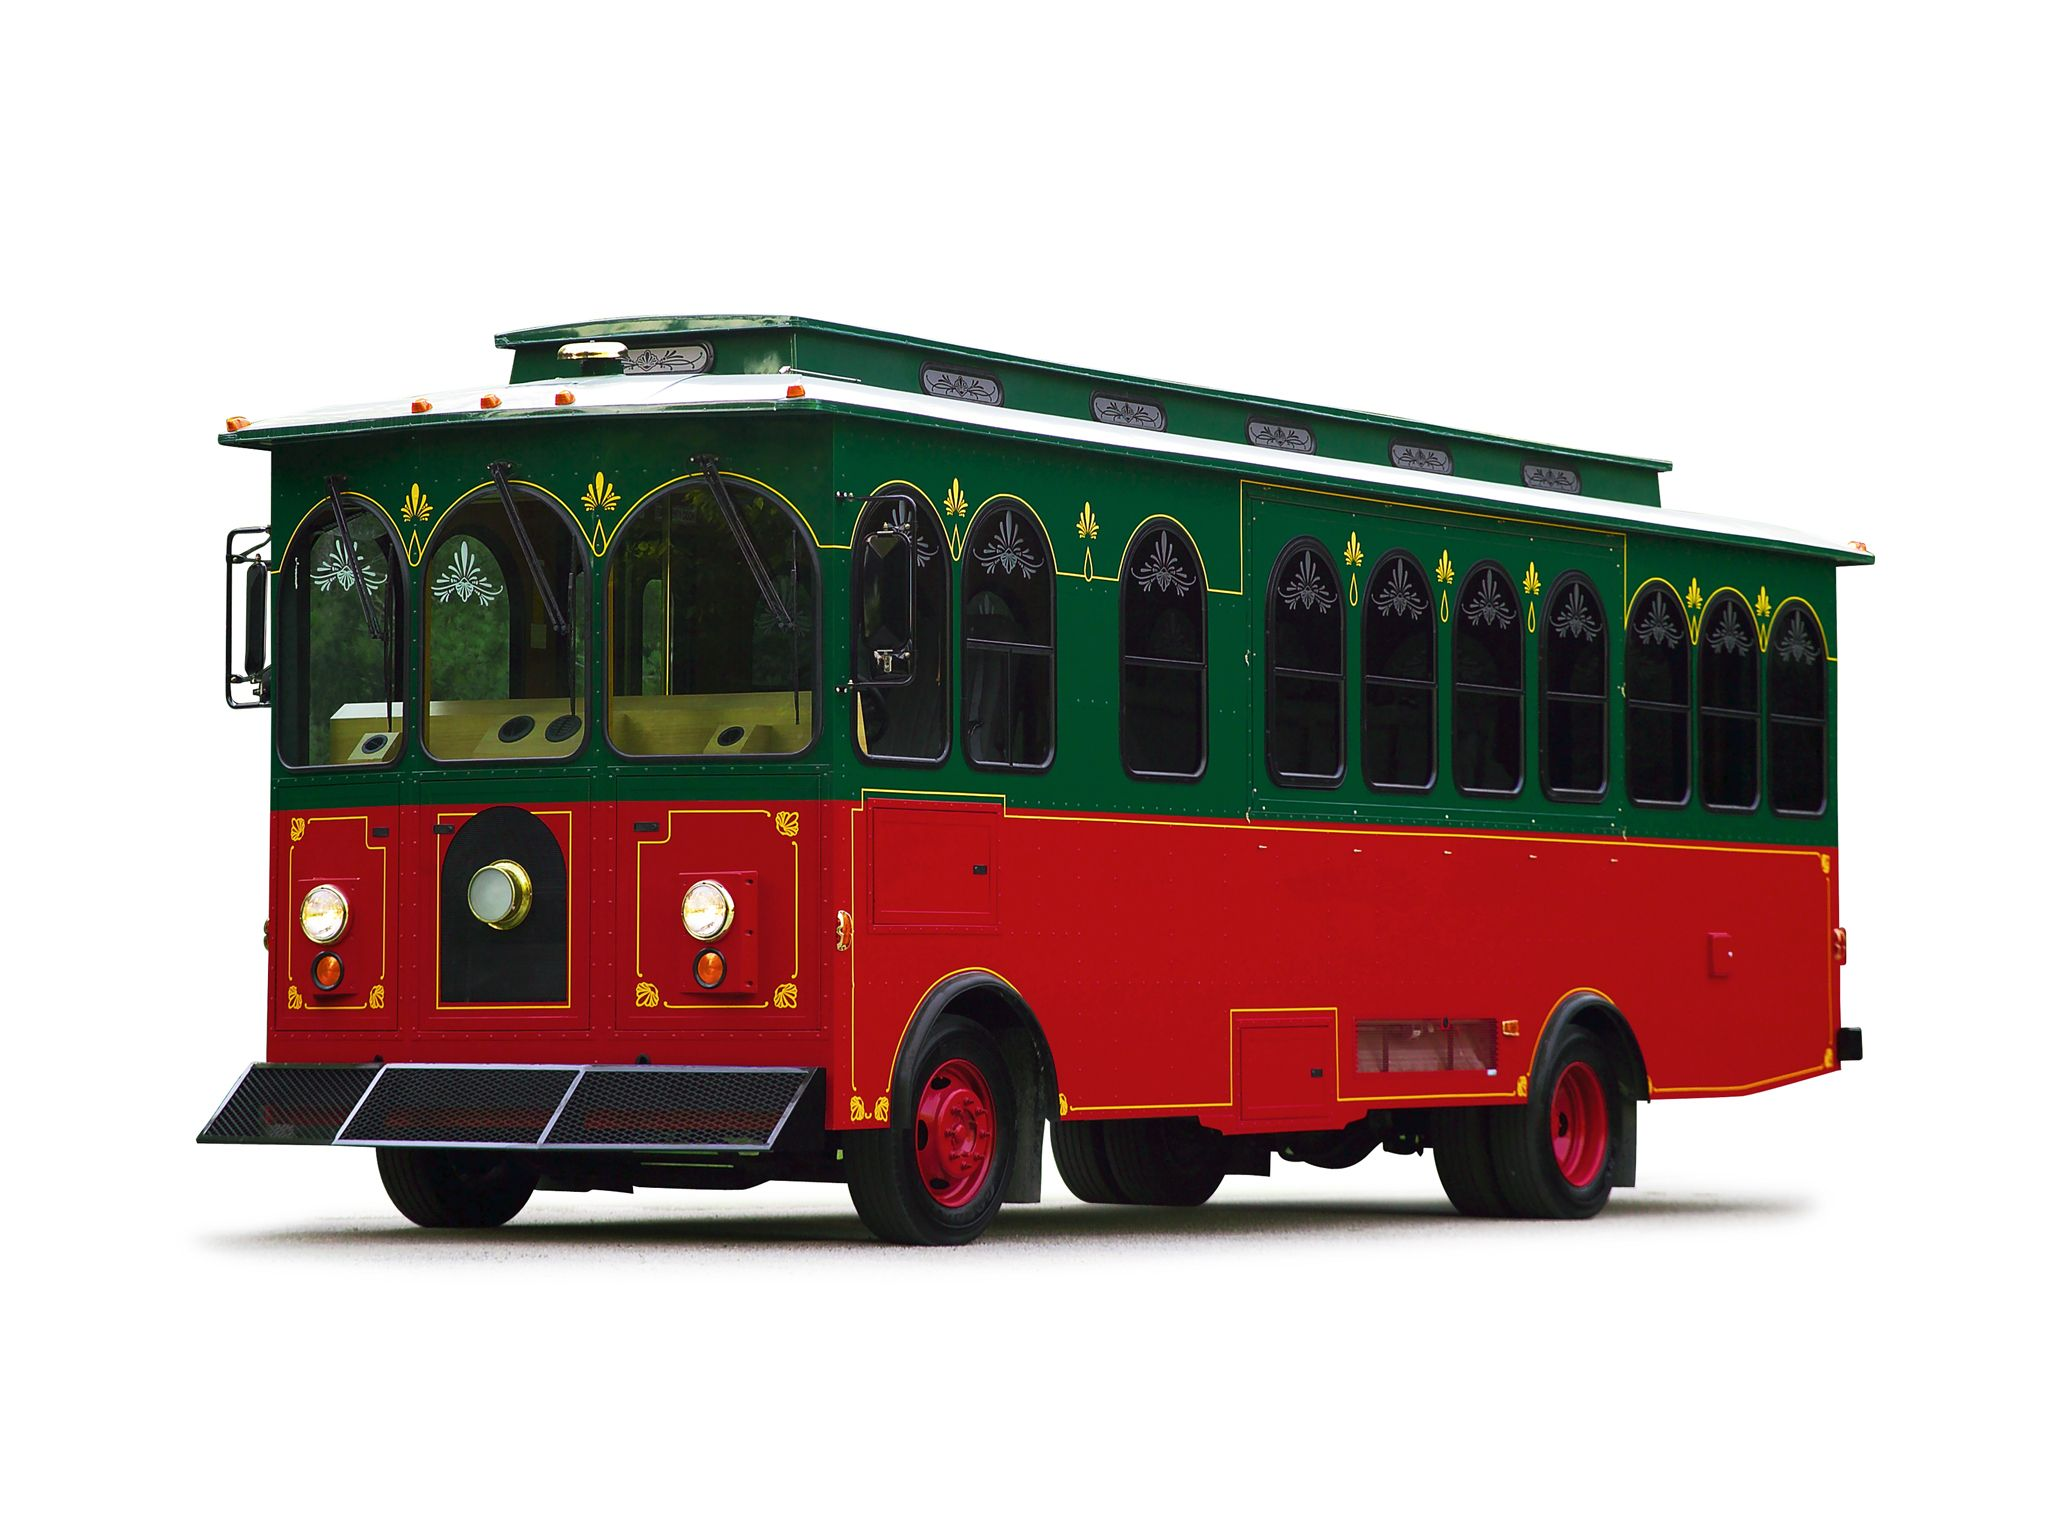 StarTrans Classic American Trolley